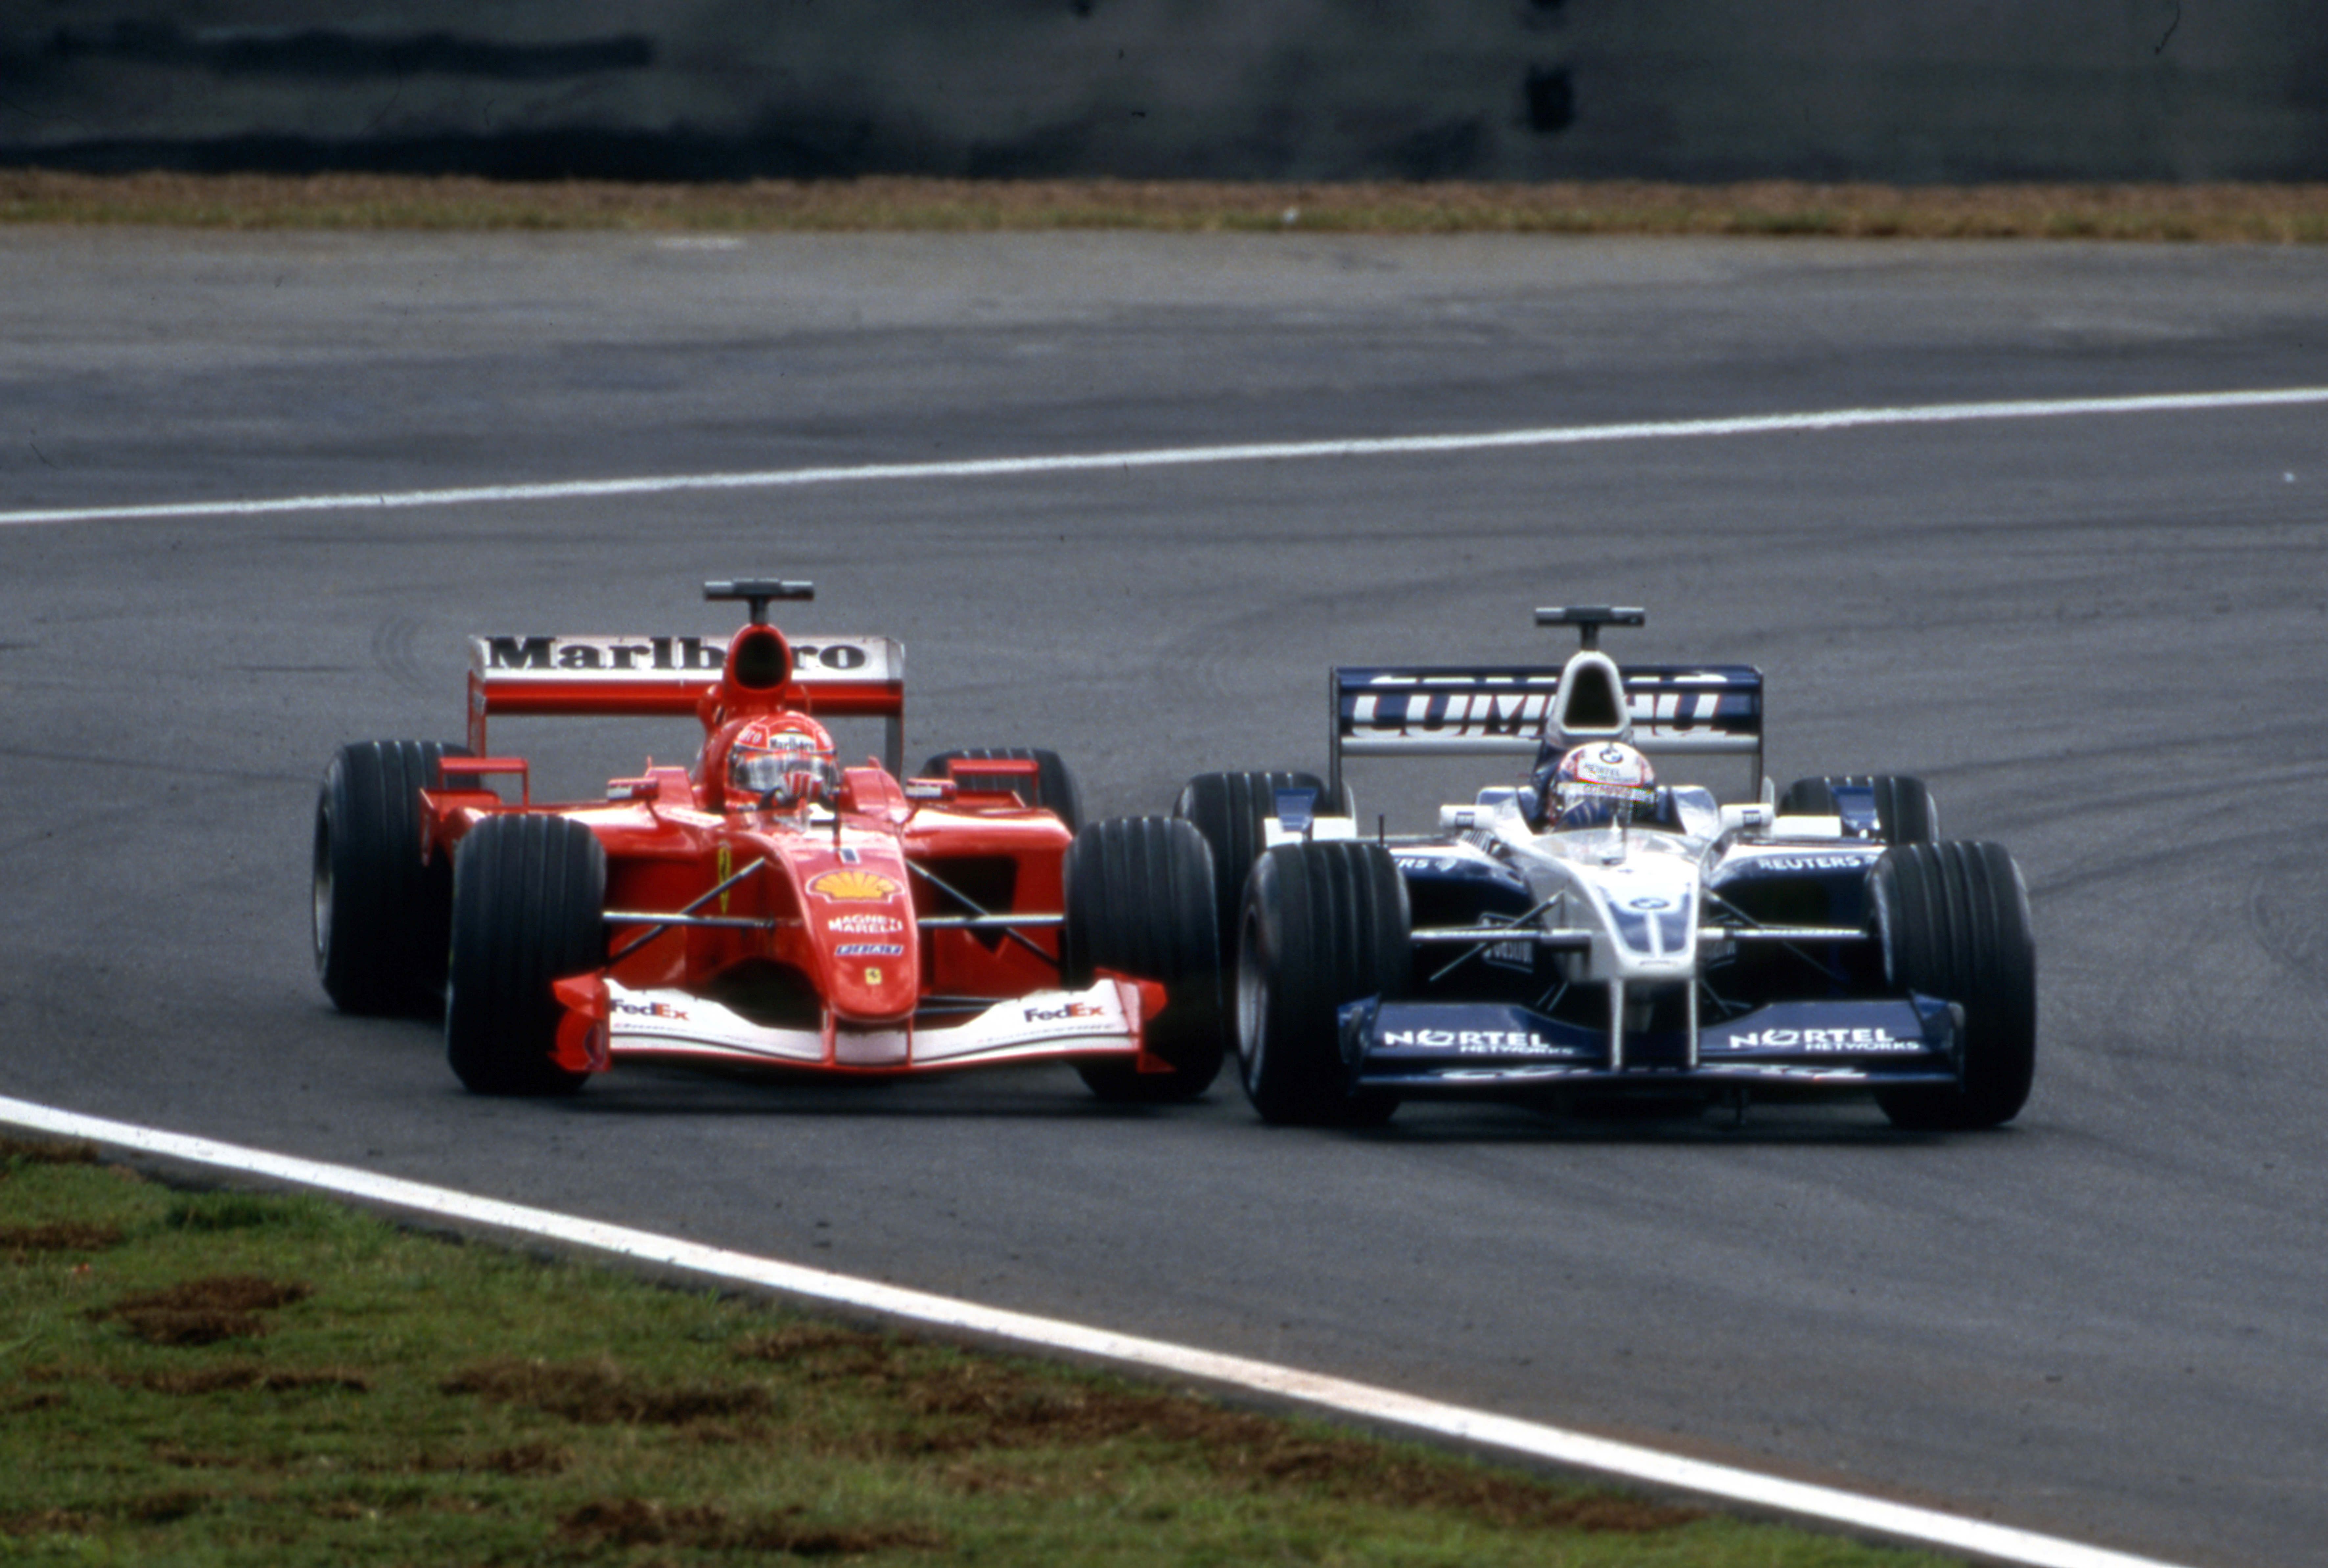 Michael Schumacher Juan Pablo Montoya Brazilian Grand Prix 2001